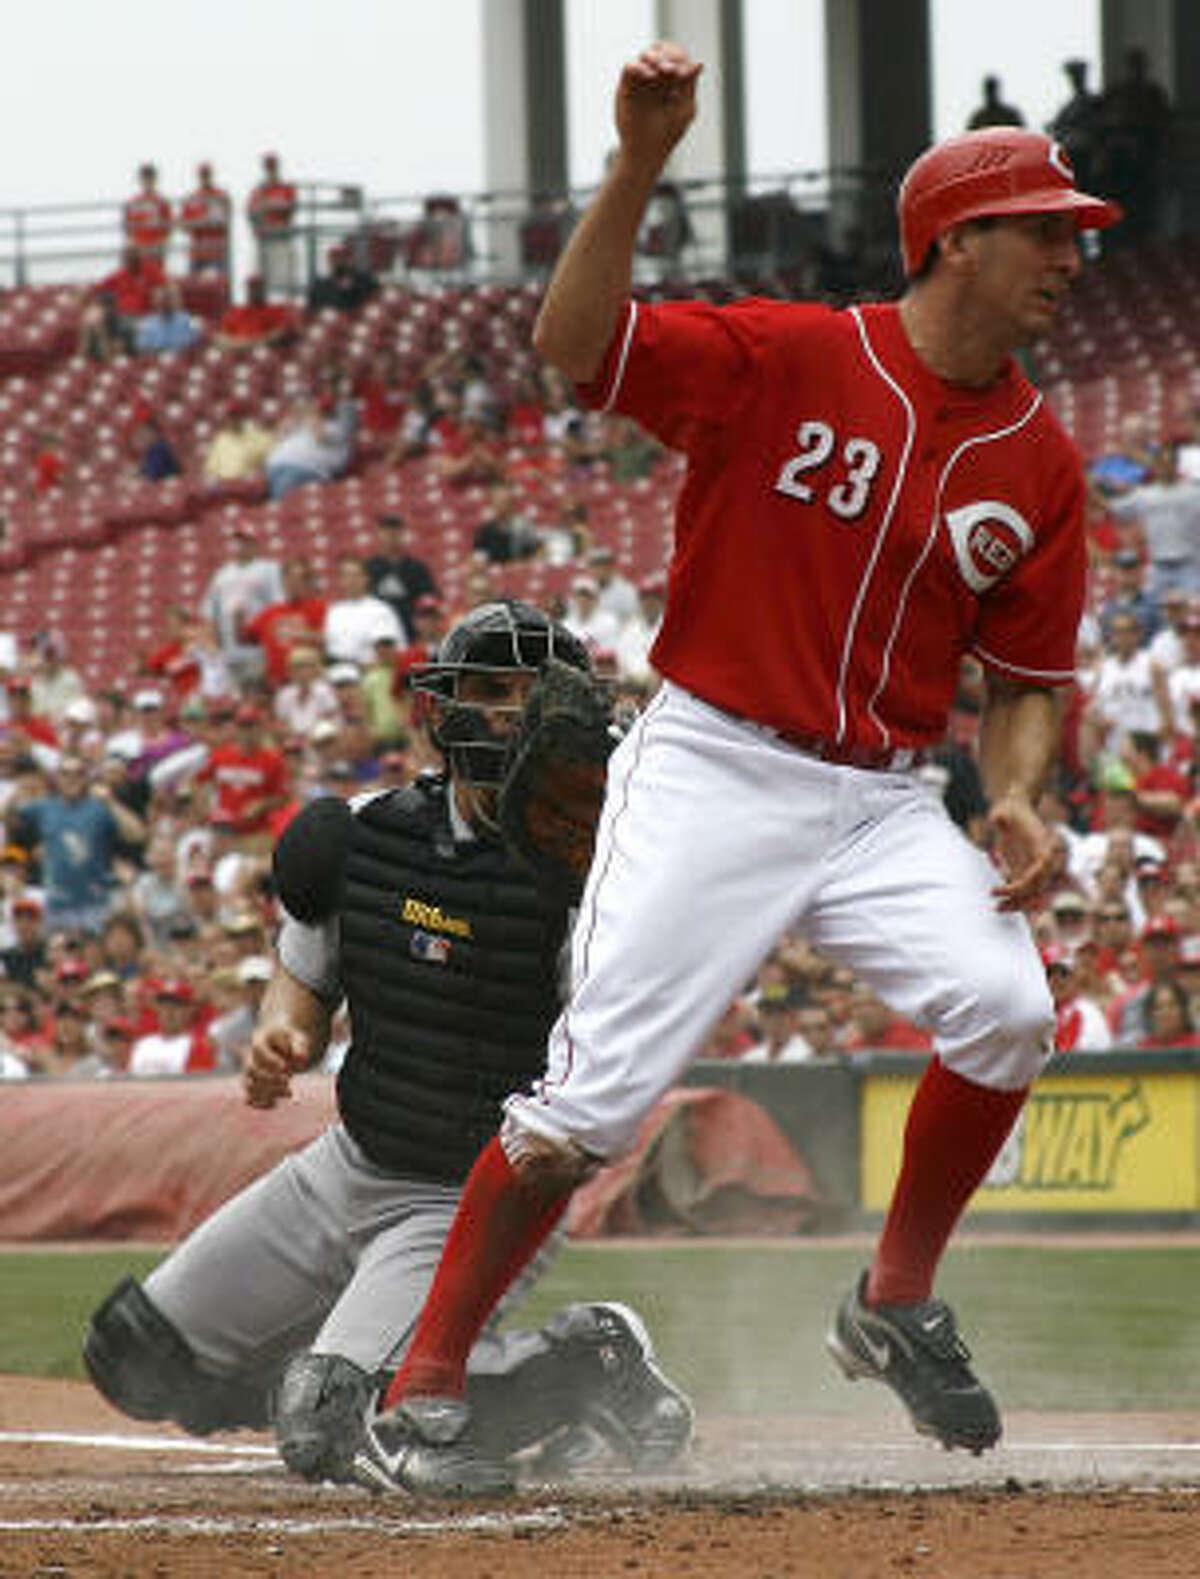 Cincinnati Reds' Adam Rosales scores on the play as Ivan Rodriguez sprained his left knee.